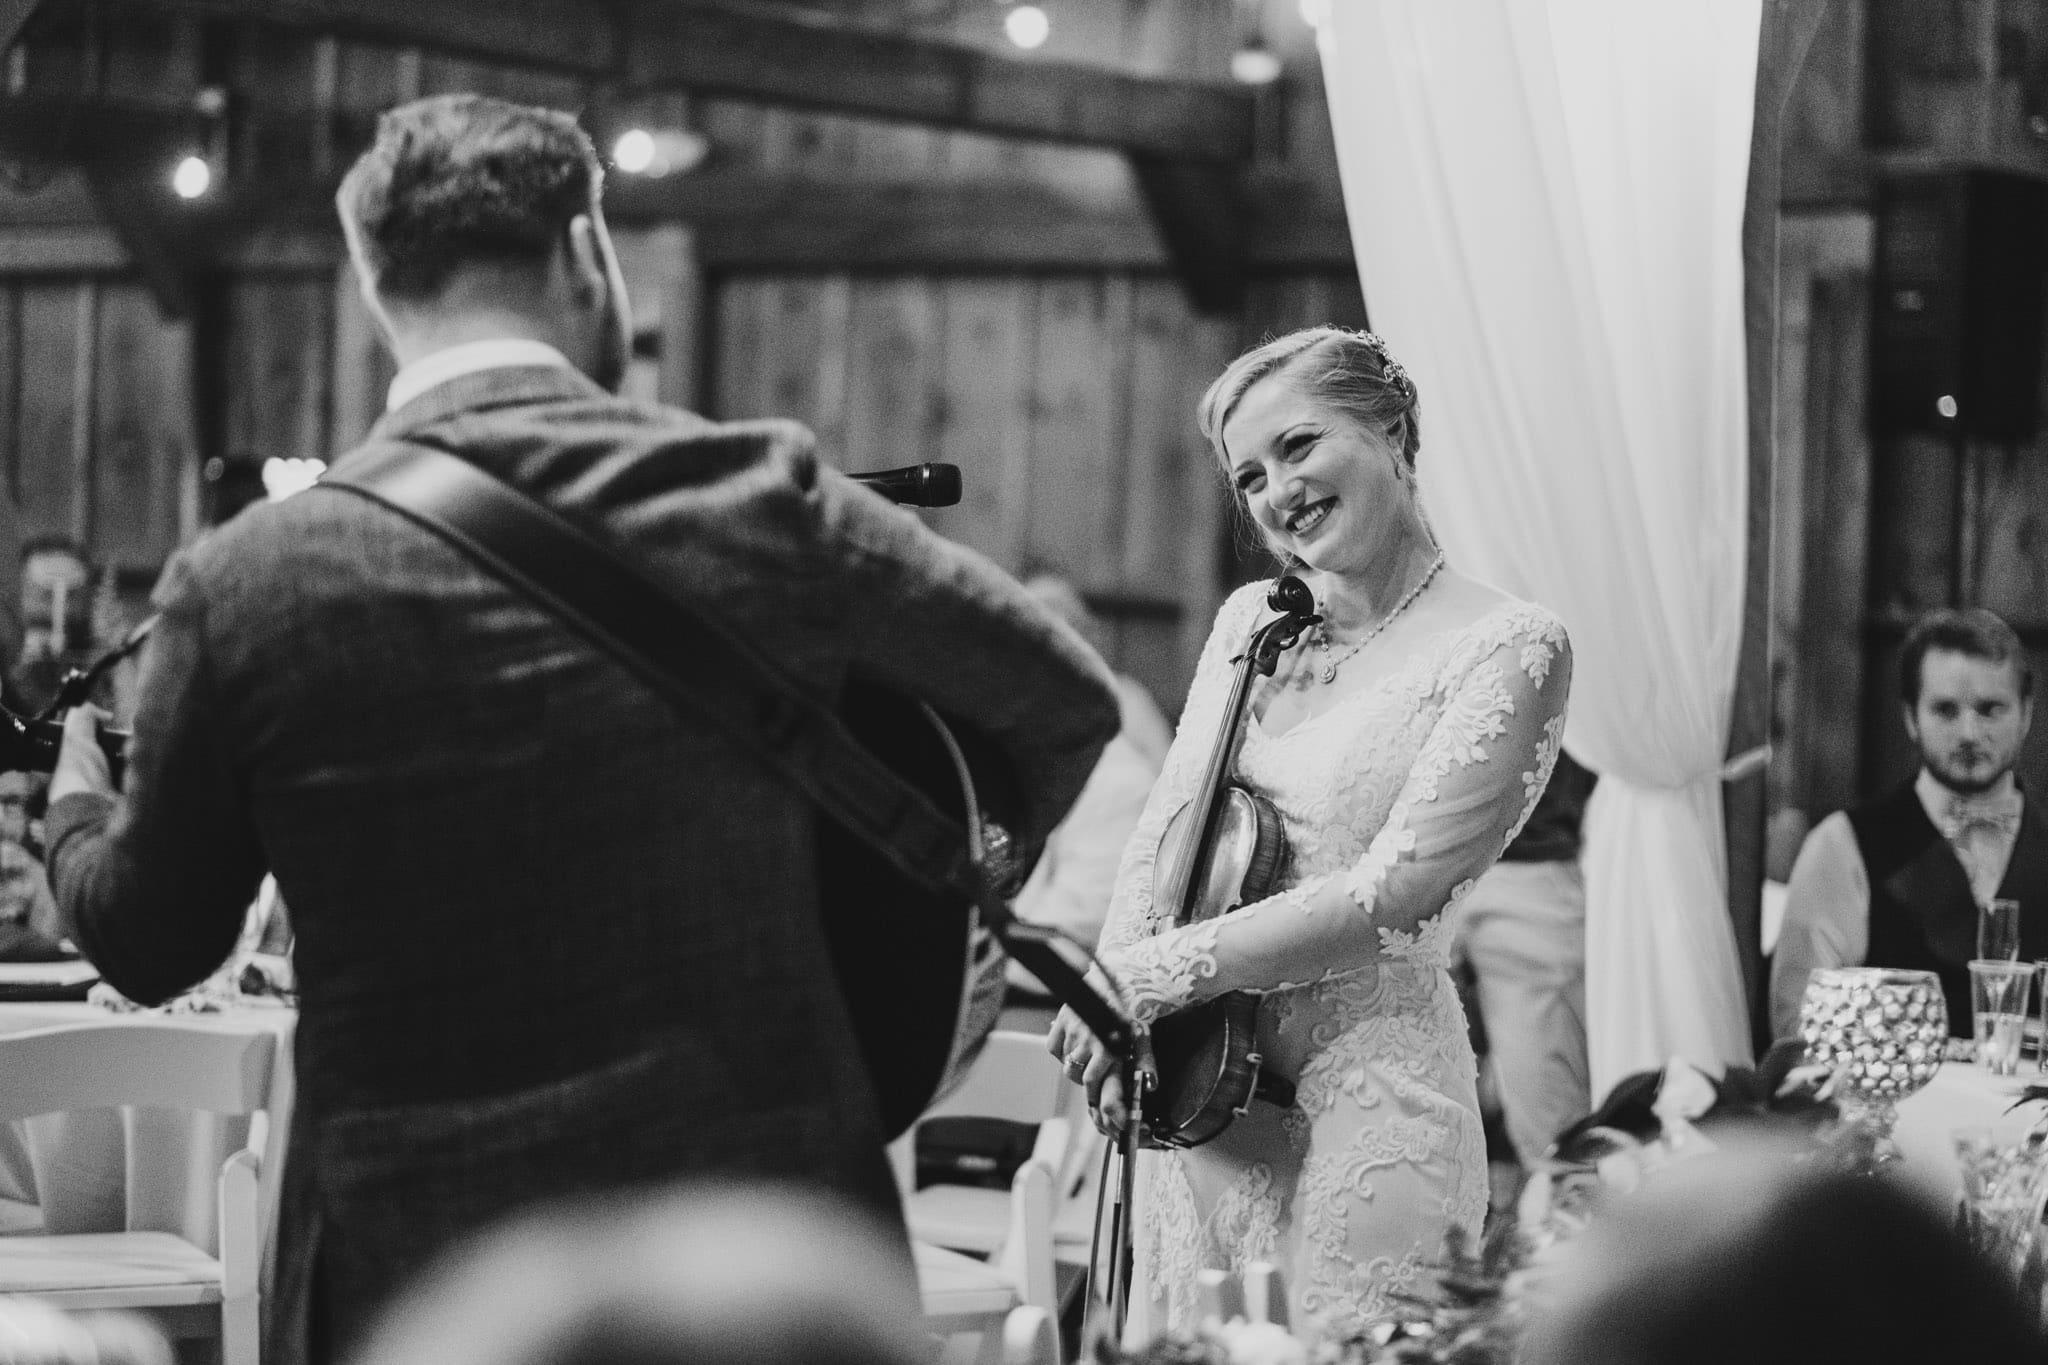 lincoln-omaha-nebraska-wedding-photography-intrepid-visuals-023